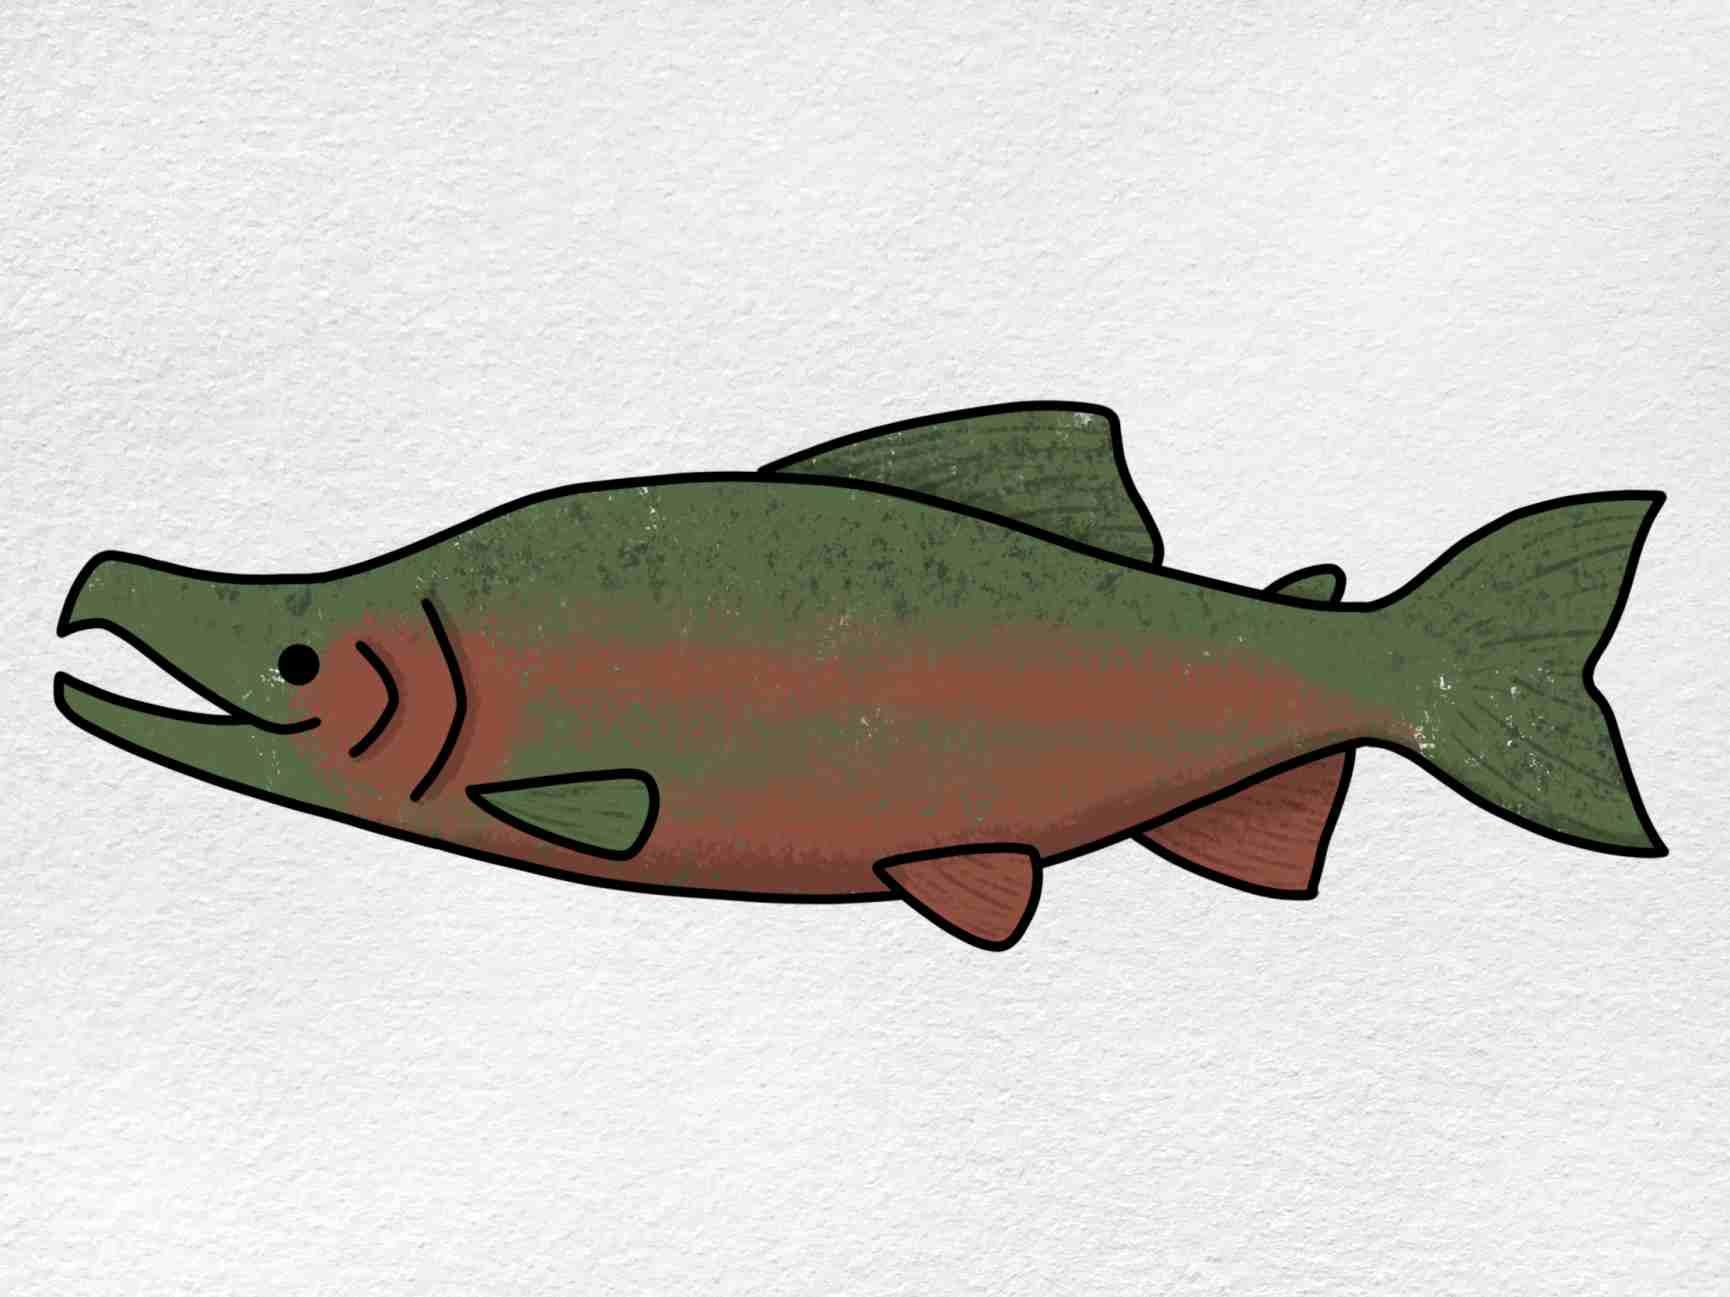 Salmon Drawing: Step 6